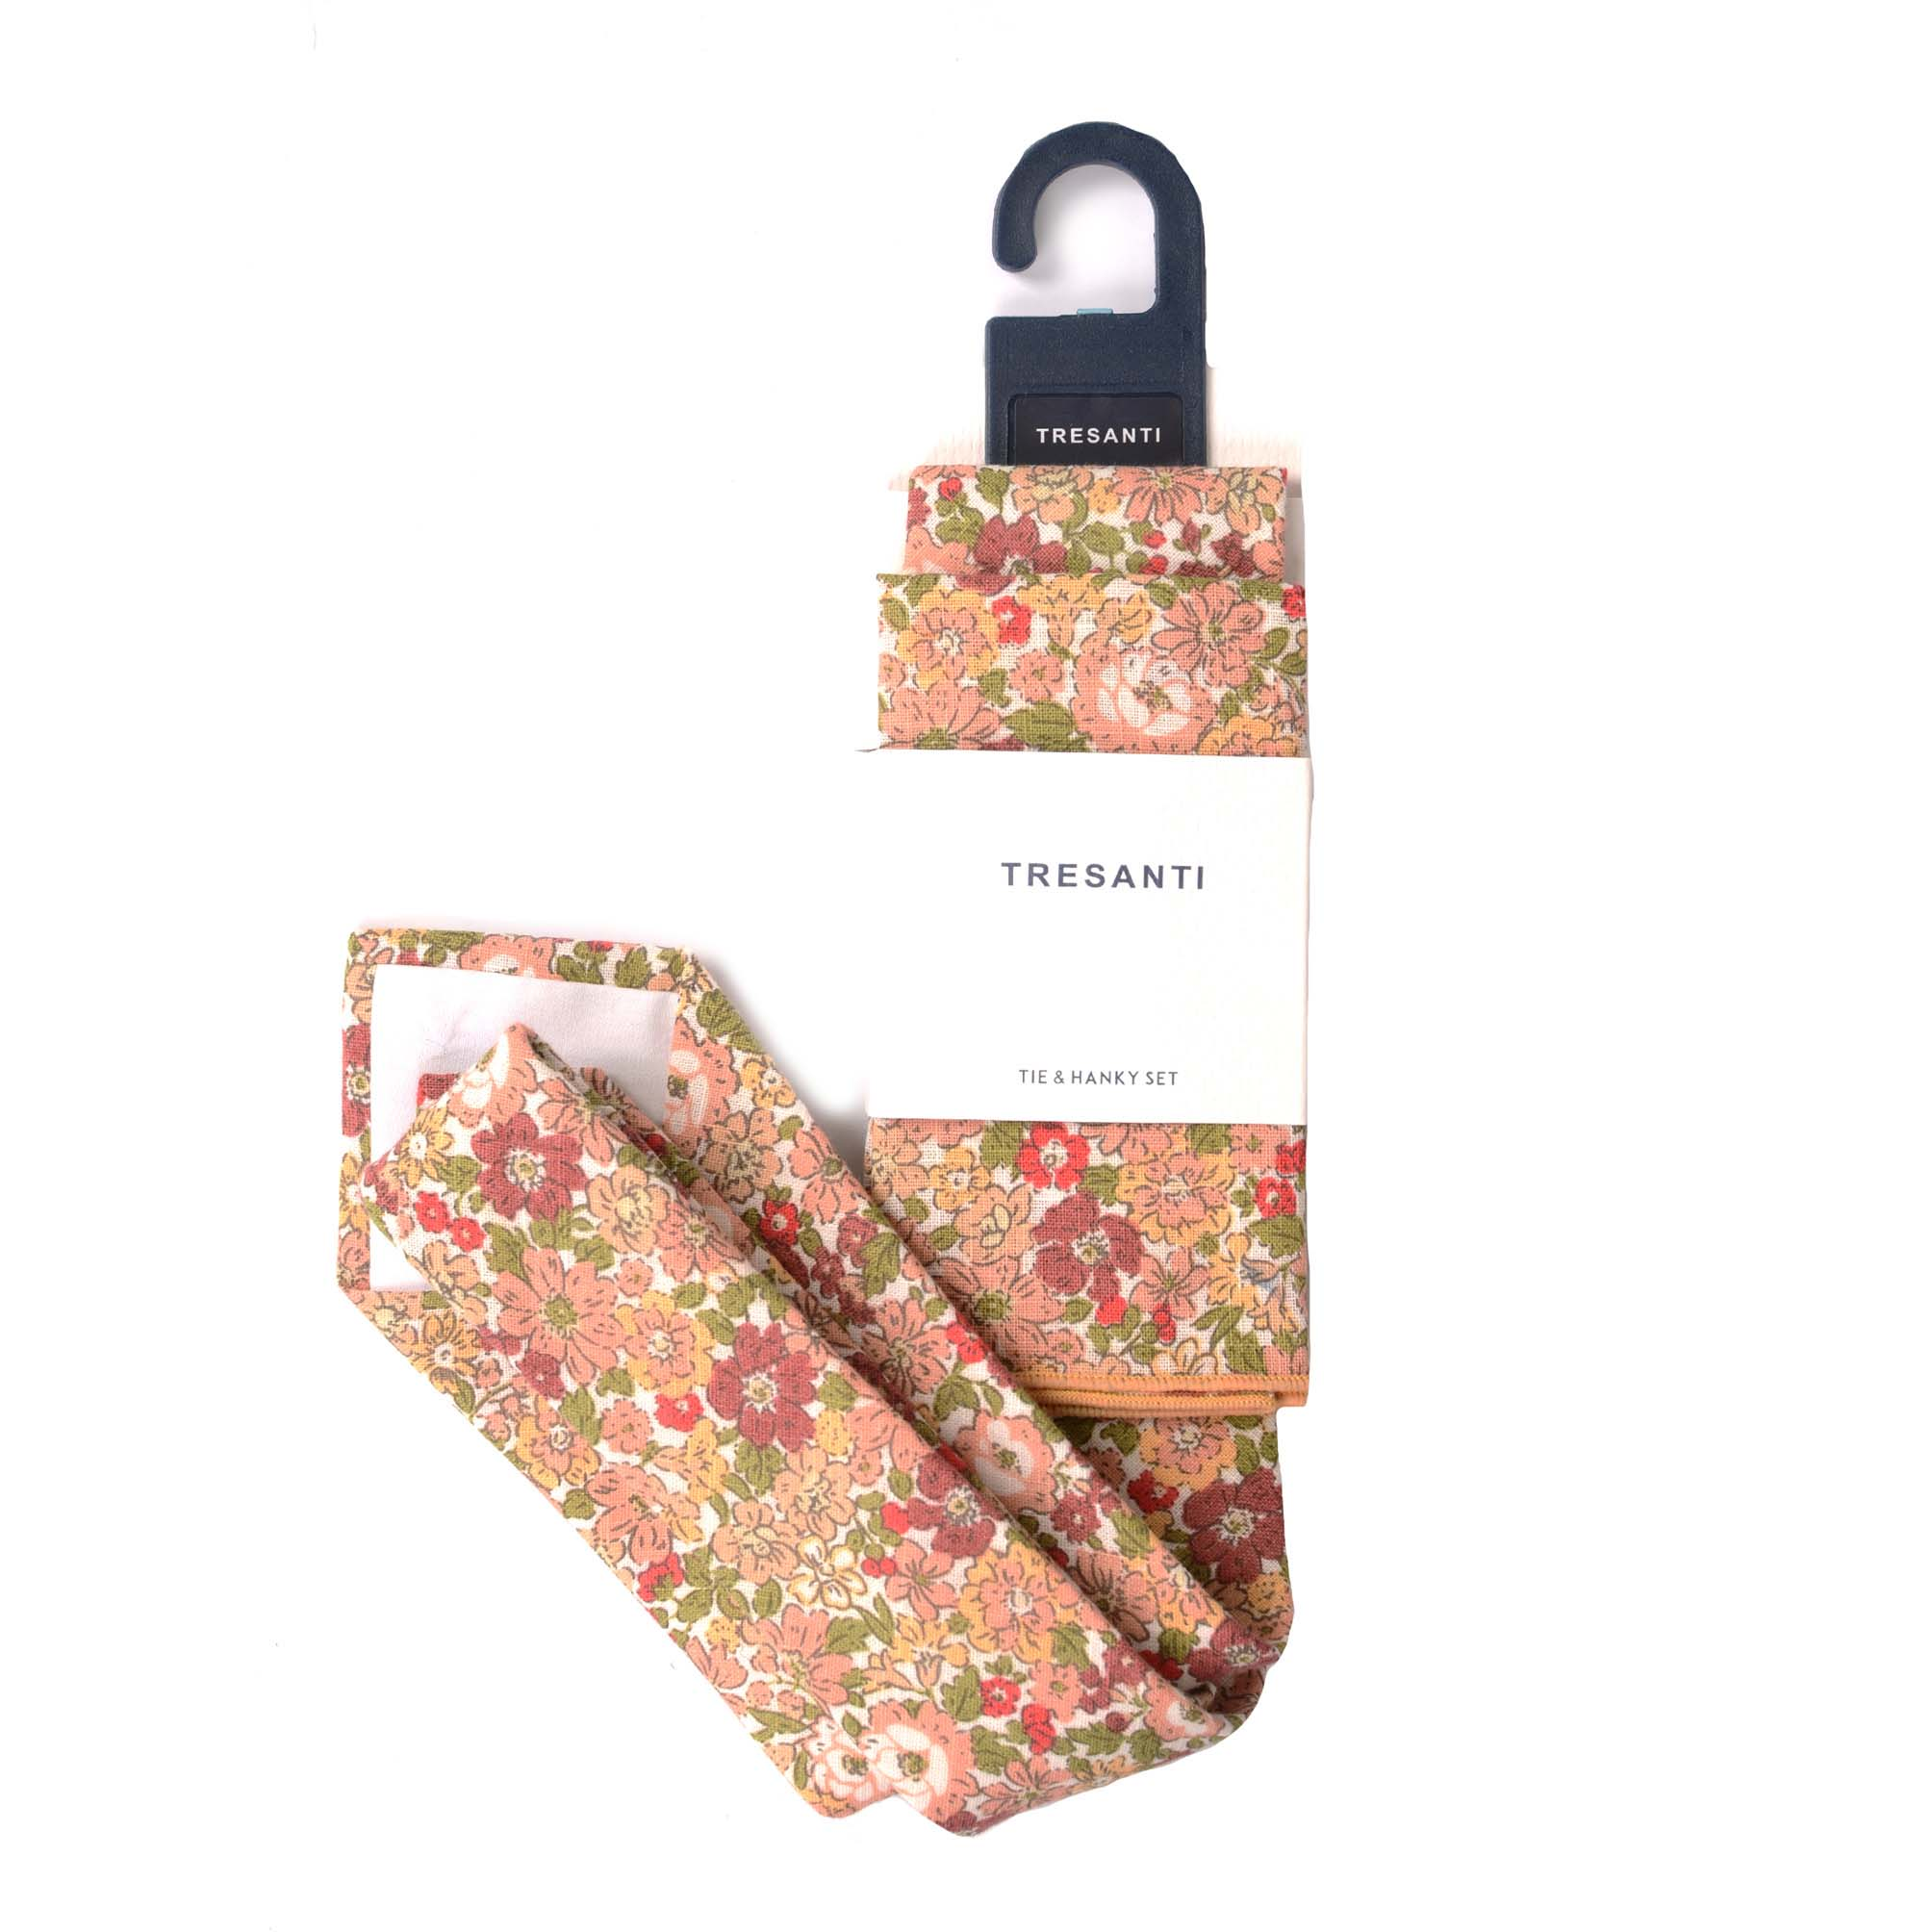 Cotton set tie & hanky  flower design